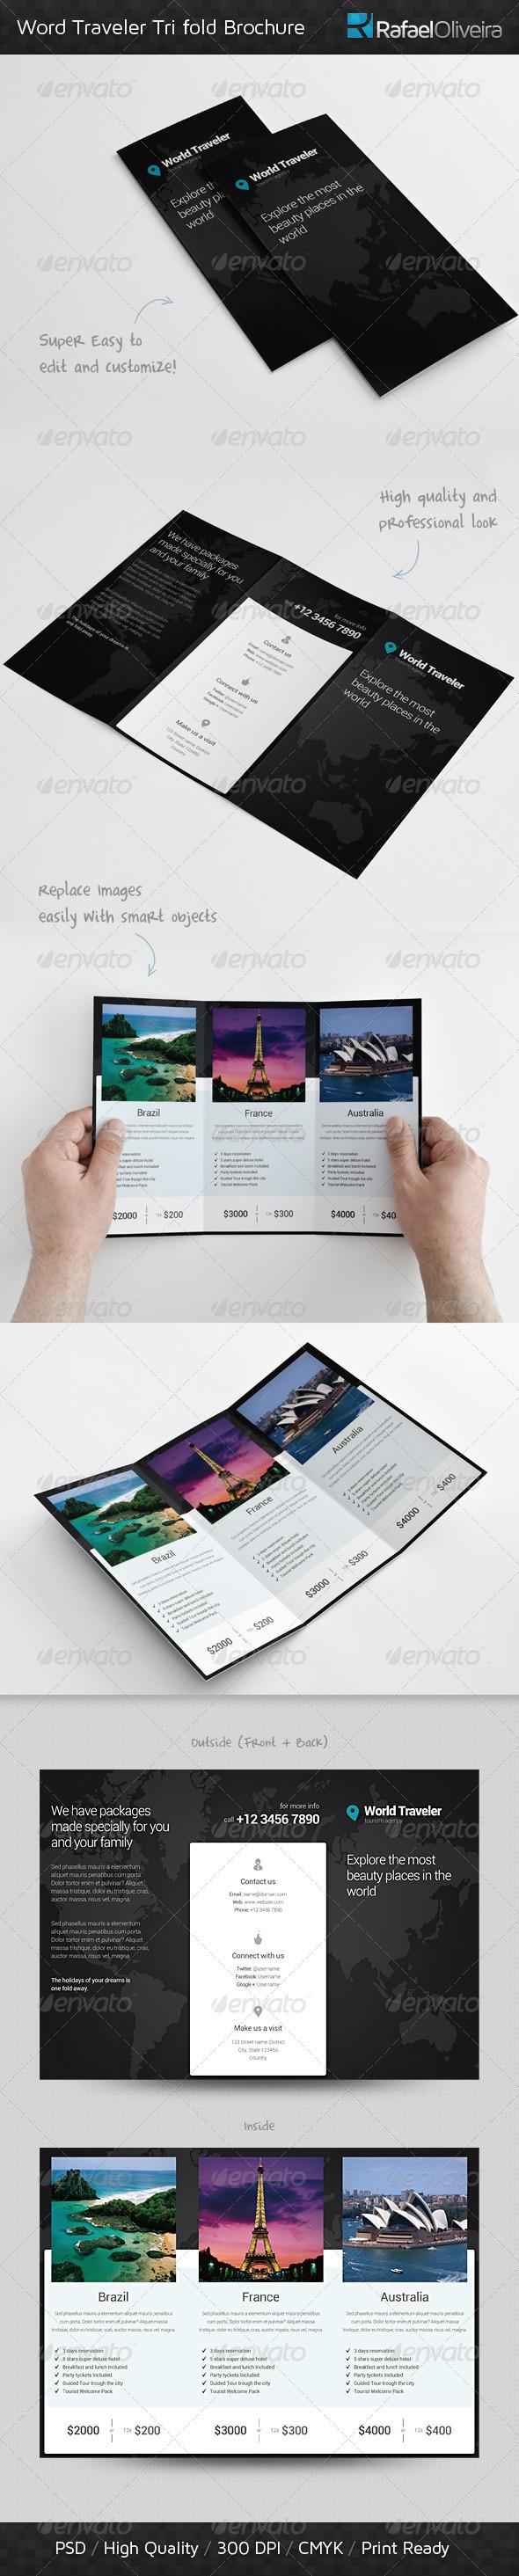 GraphicRiver World Traveler Tri Fold Brochure 3930288